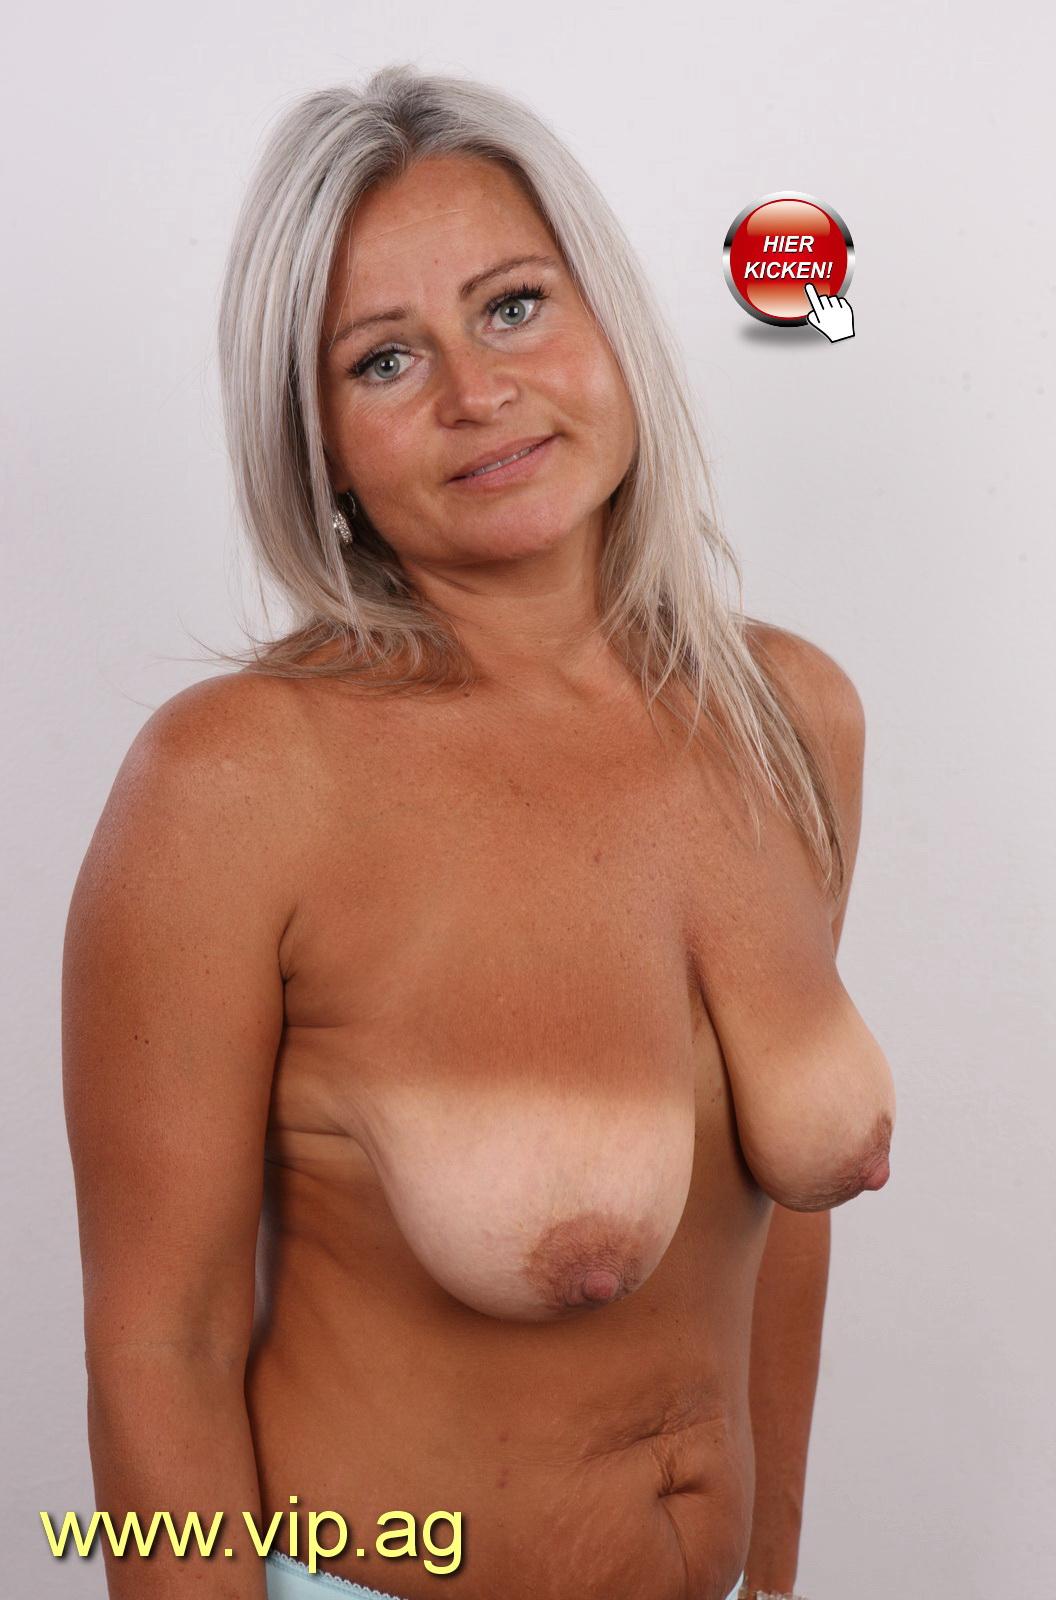 große Titten Lisa